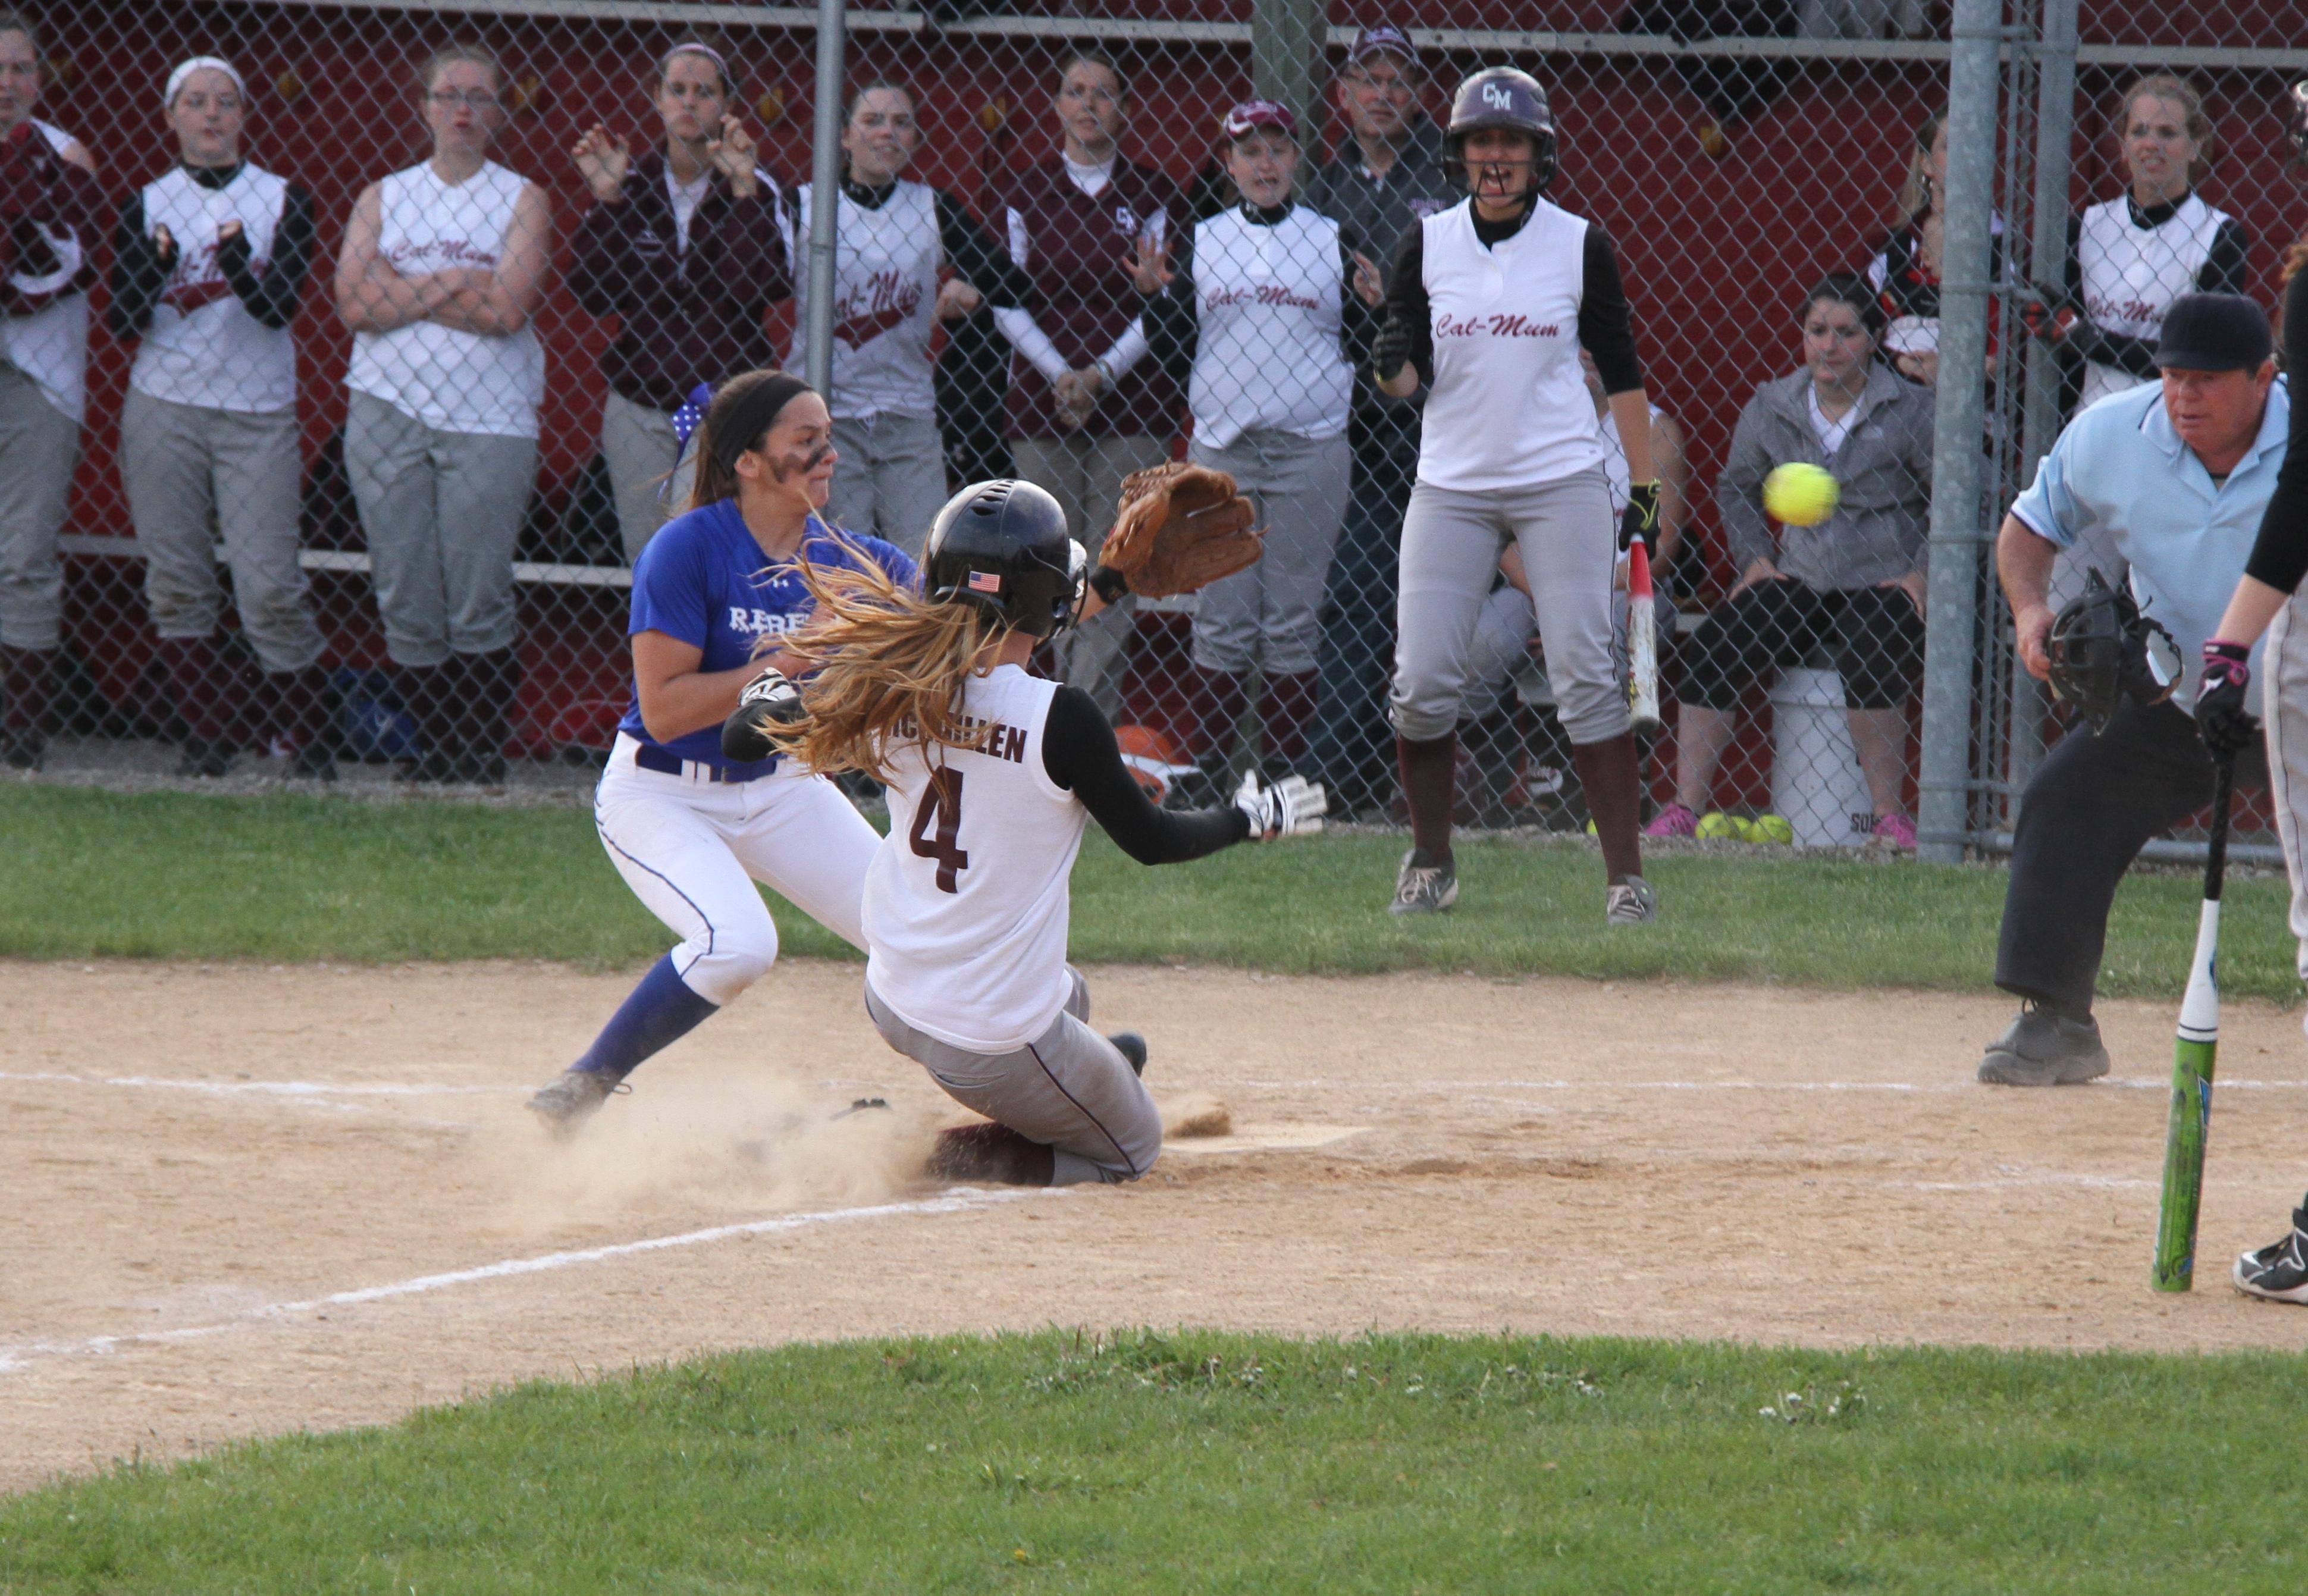 Softball: Cal-Mum wins third straight sectional title